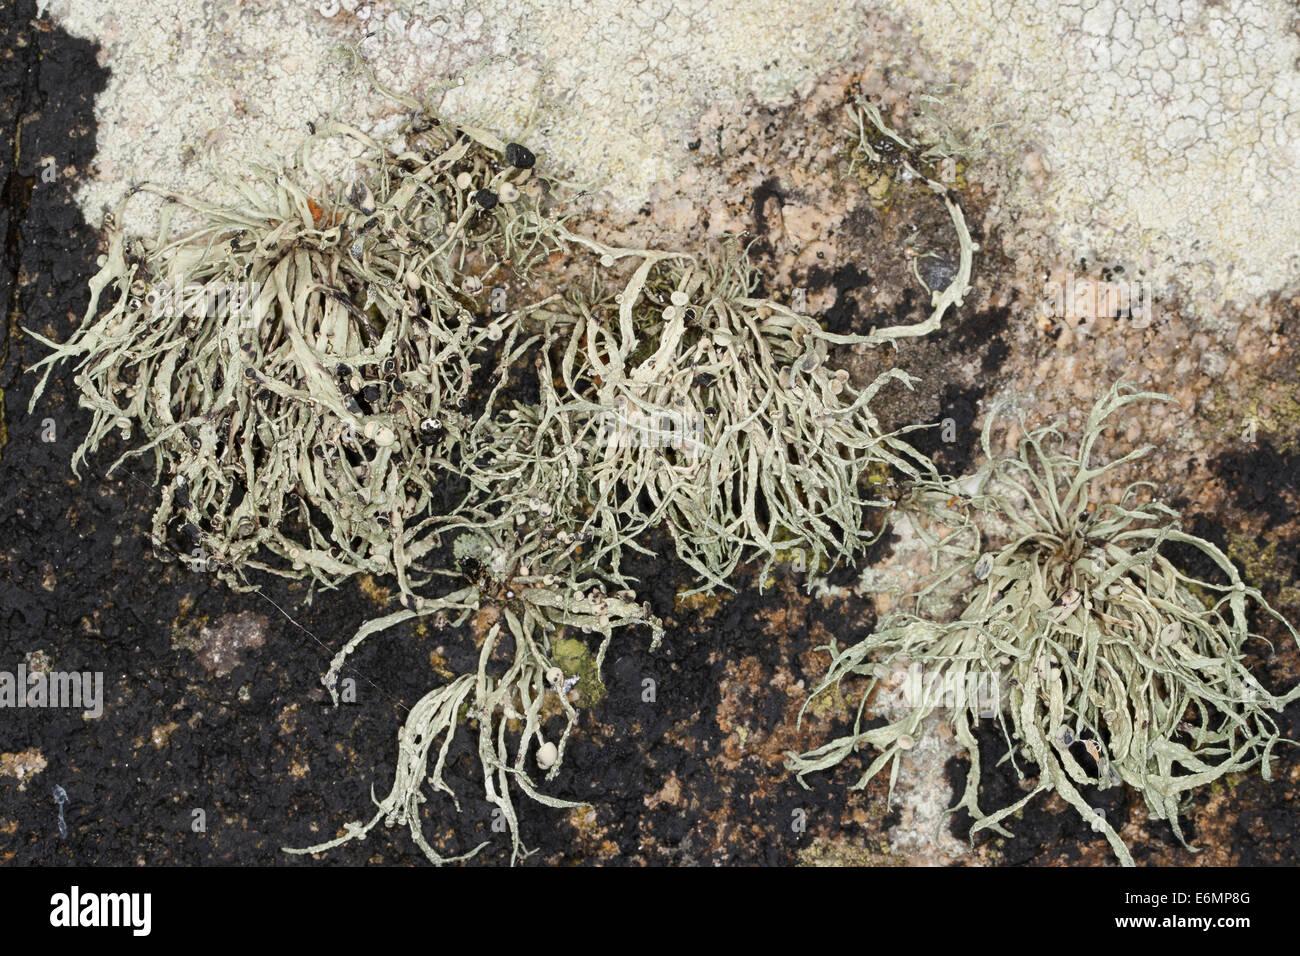 Mare Lichene d avorio sulle rocce e pareti di pietra su coastland, Grüngraue Astflechte, Strauchflechte, Küstenfelsen, Immagini Stock